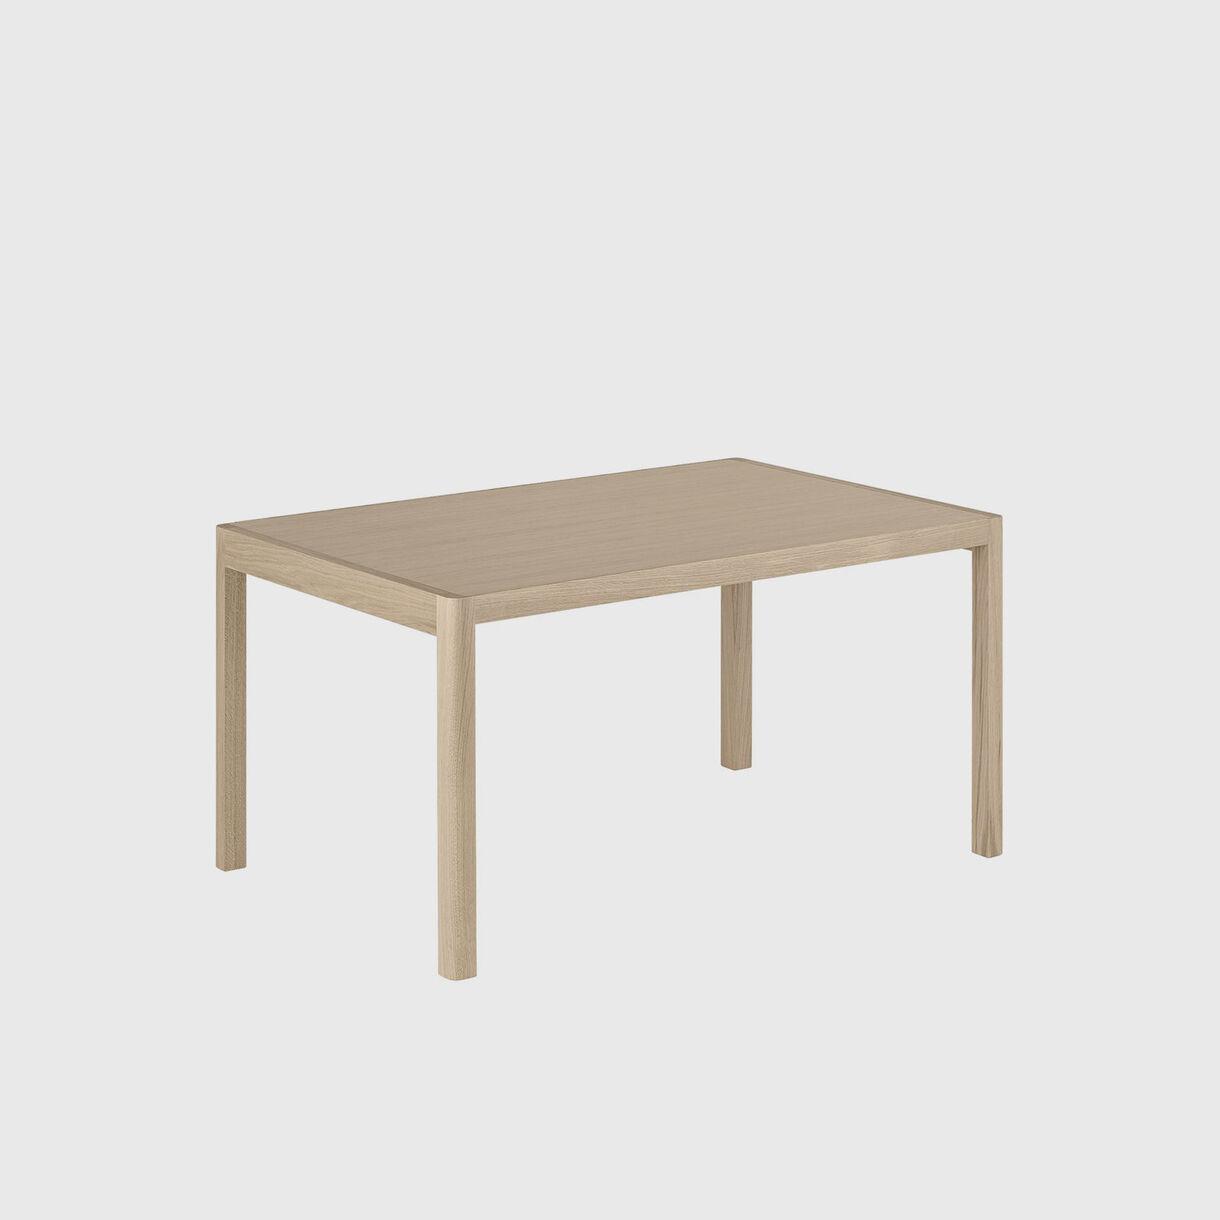 Workshop Dining Table, 1400 x 920, Oak